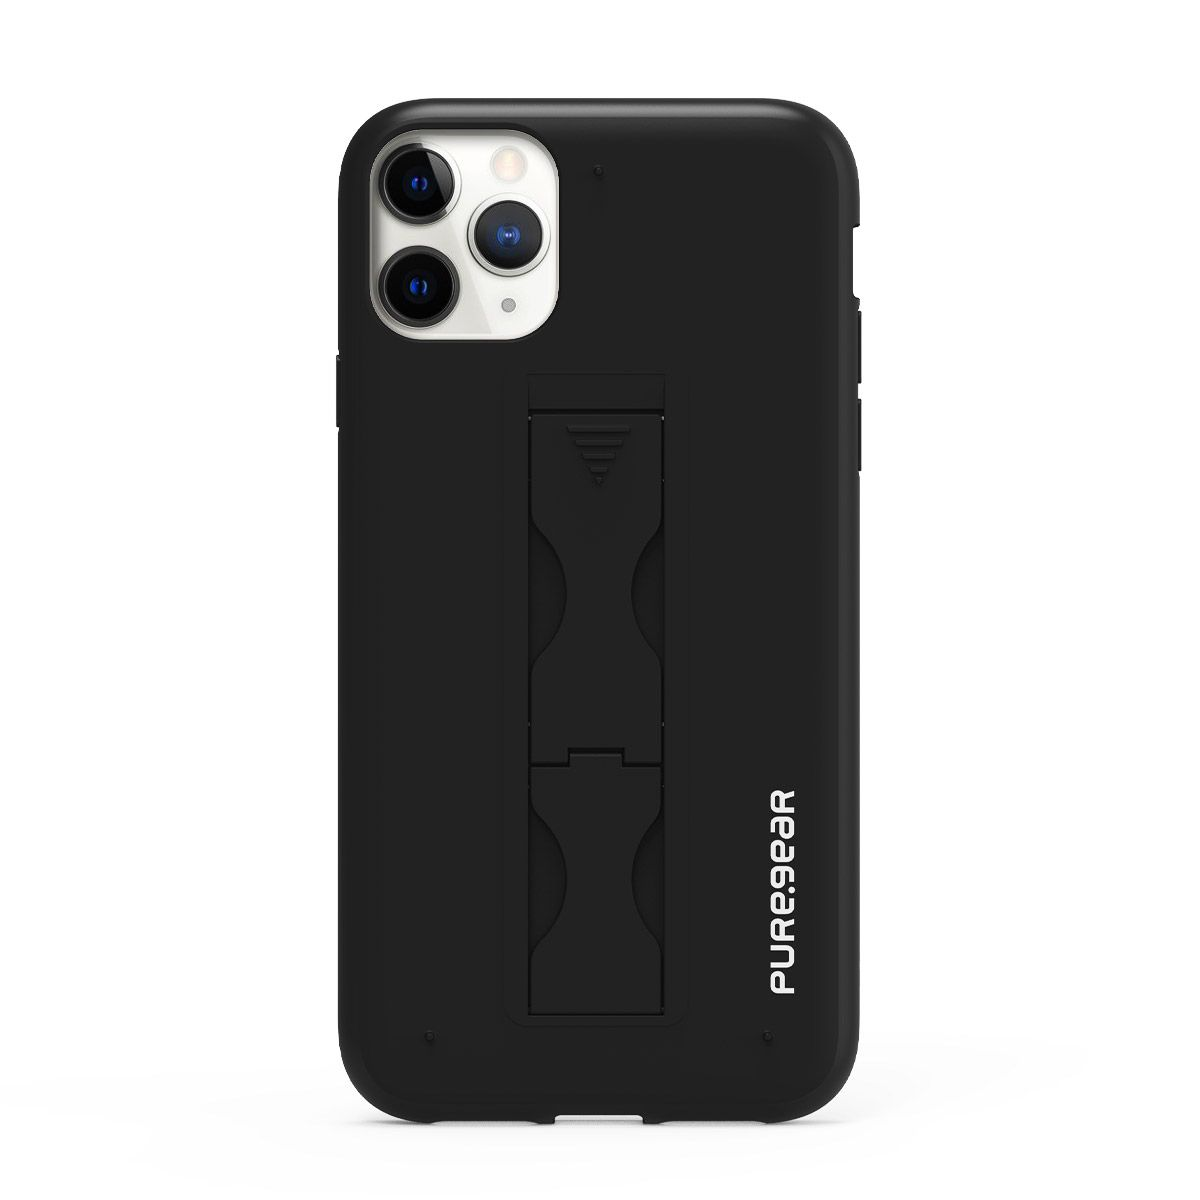 Apple iPhone 11 Pro SlimStik, Antimicrobial Kickstand Case – Nightfall